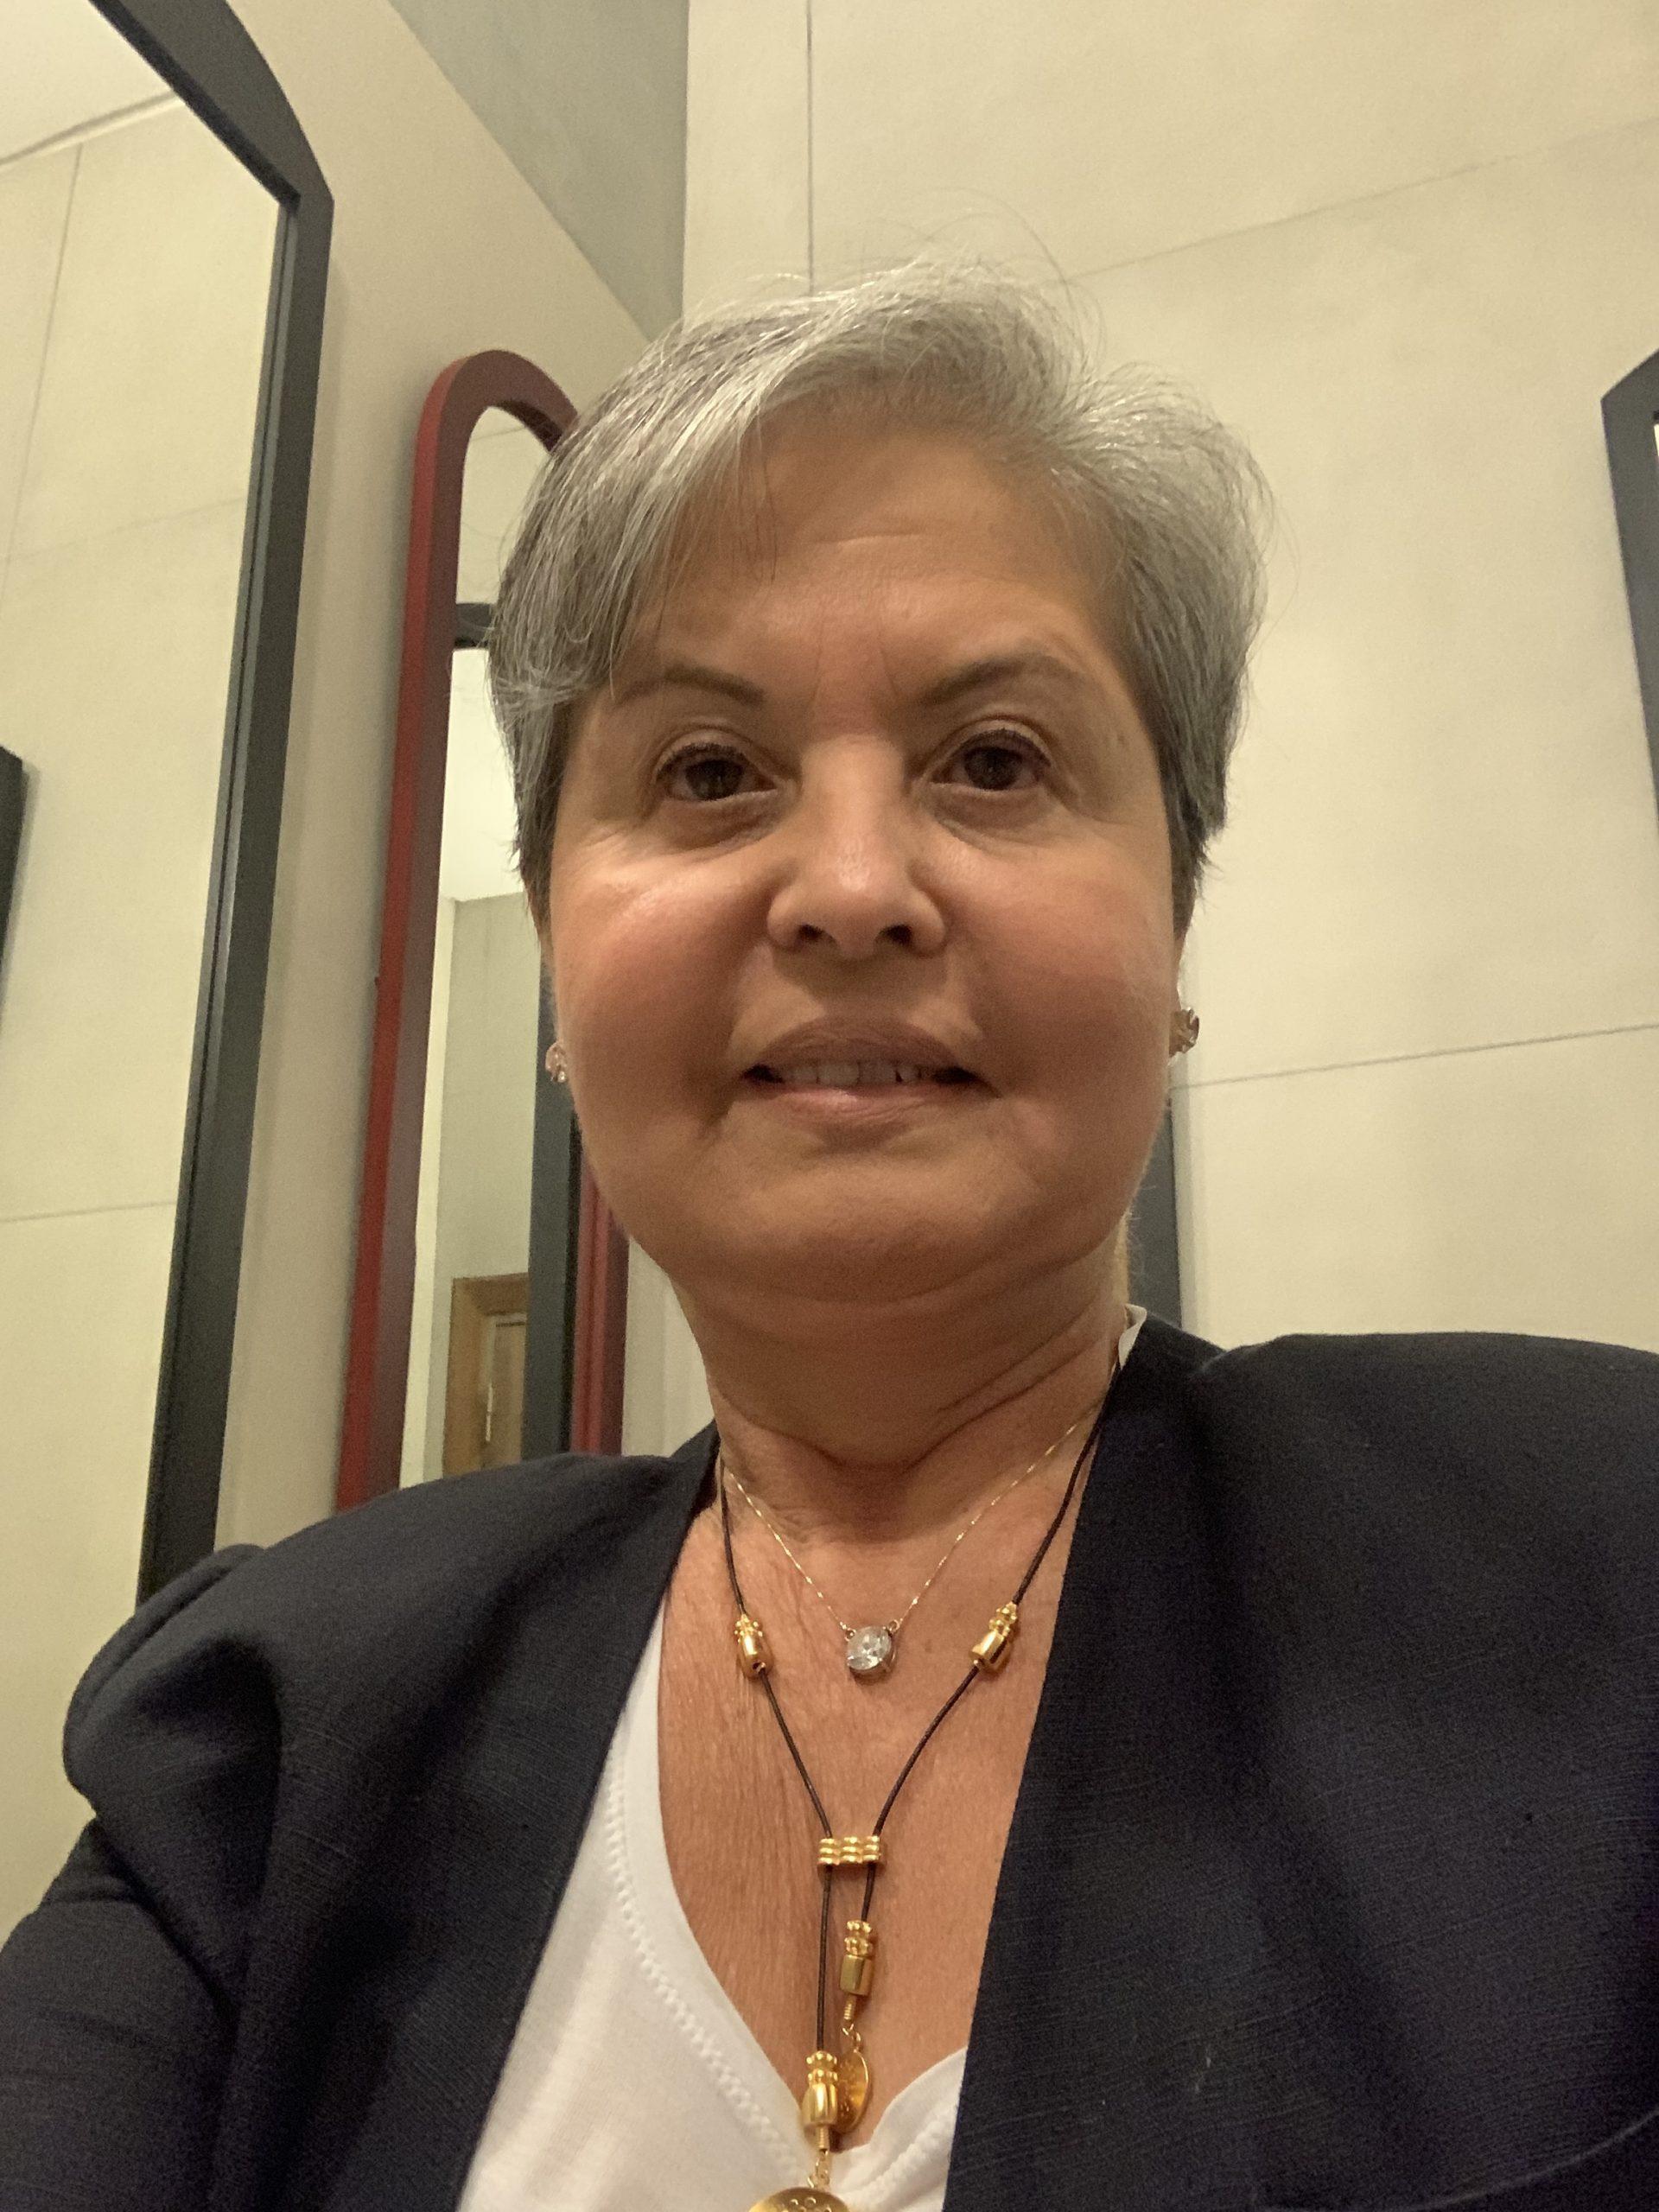 MARIA TERESA SERVIN & ASOC., Maria Teresa Servin, Asuncion, Paraguay